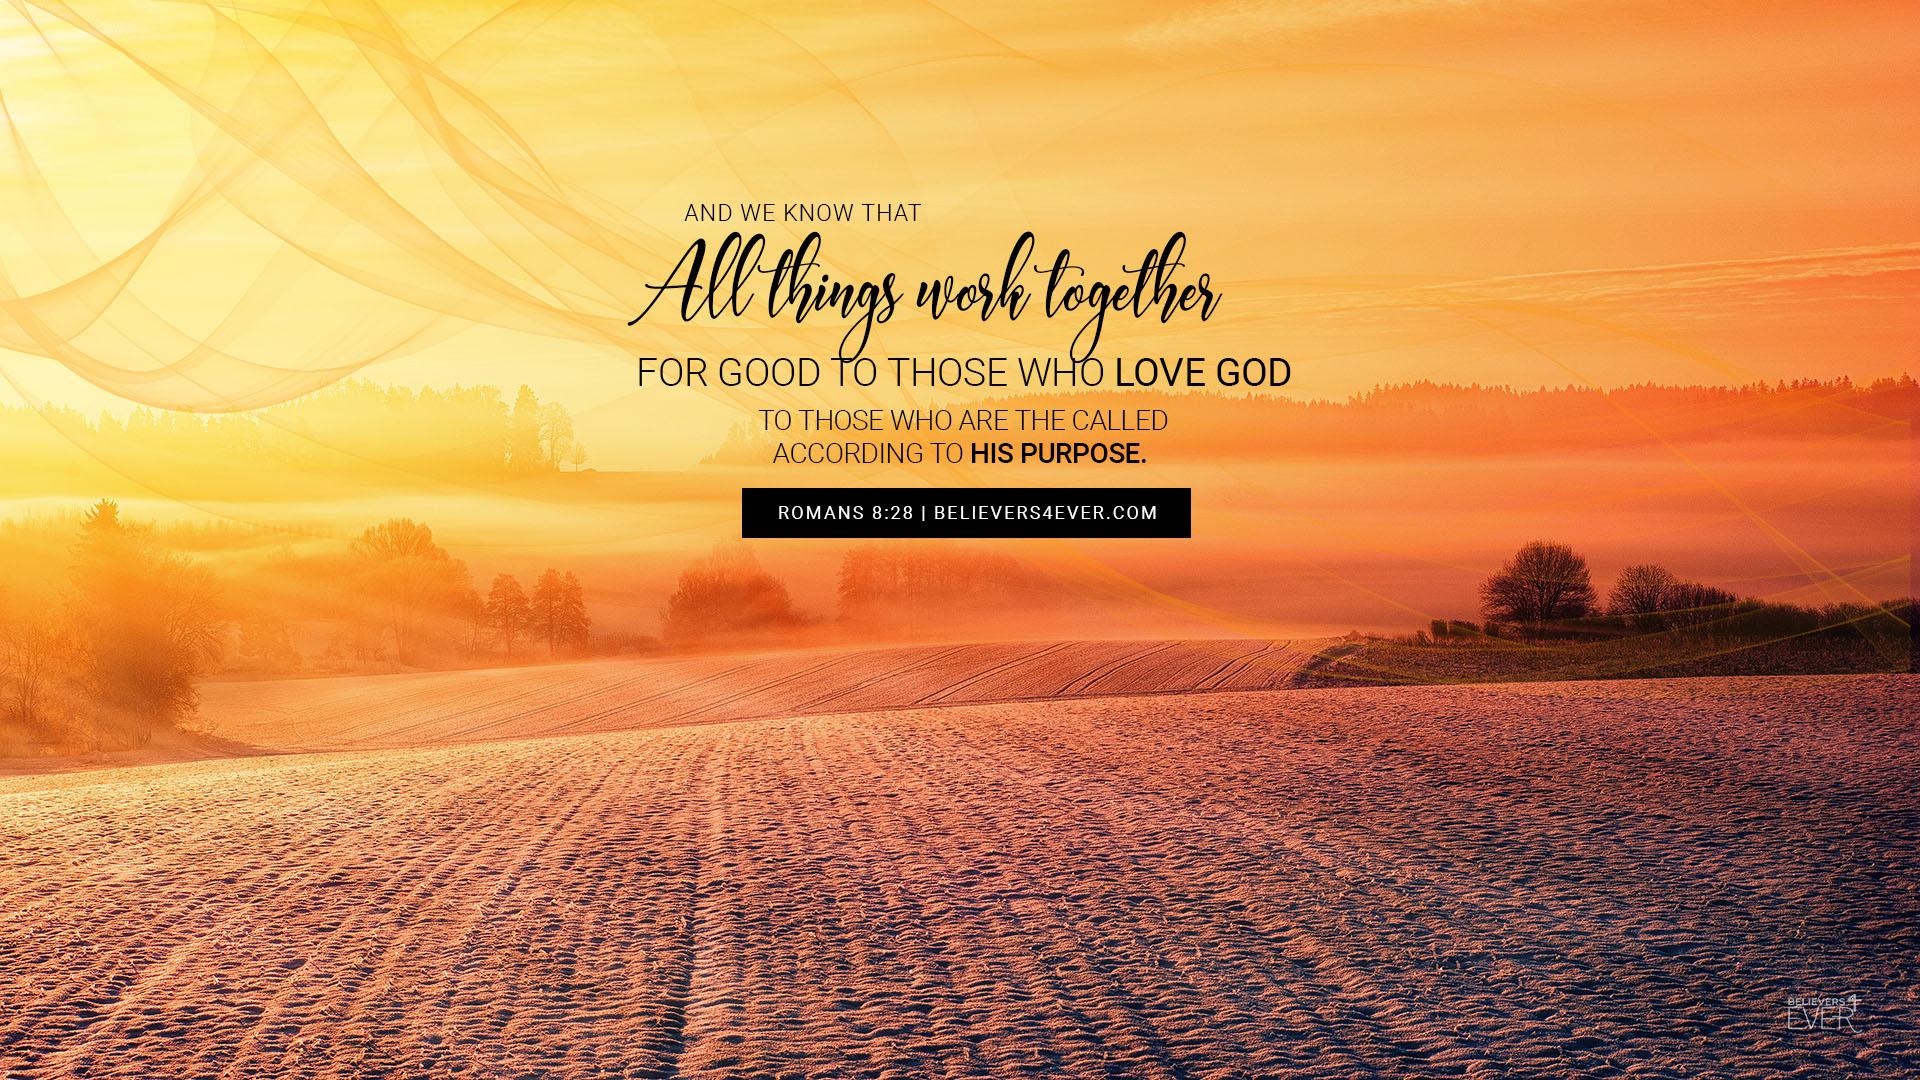 Free Desktop Wallpaper Scripture Fall Inspiring You Are My Hiding Place Believers4ever Com